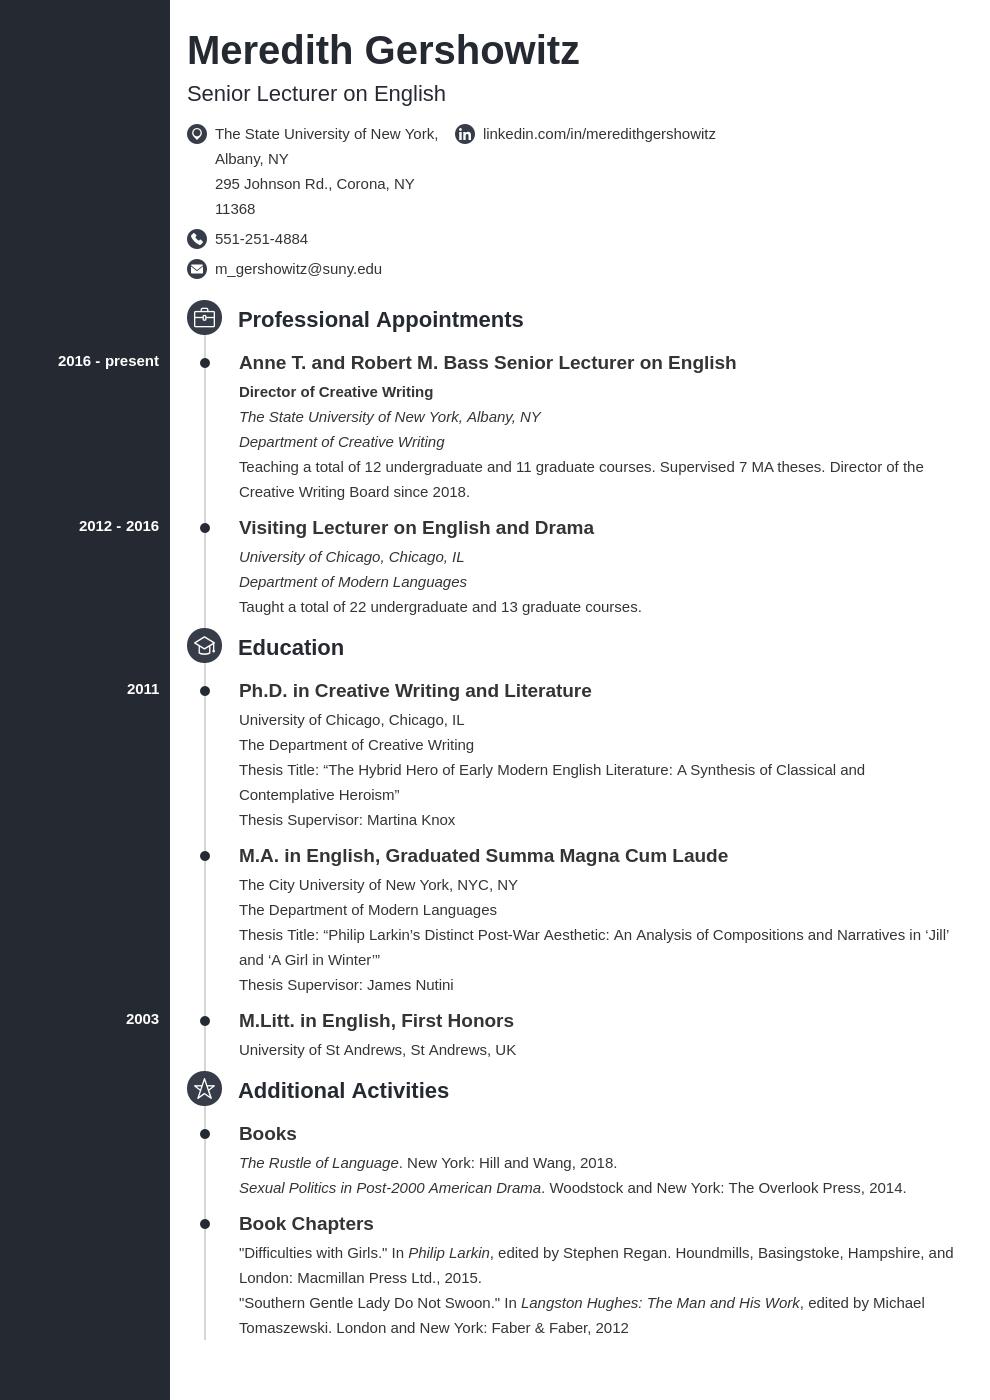 cv academic template concept uk